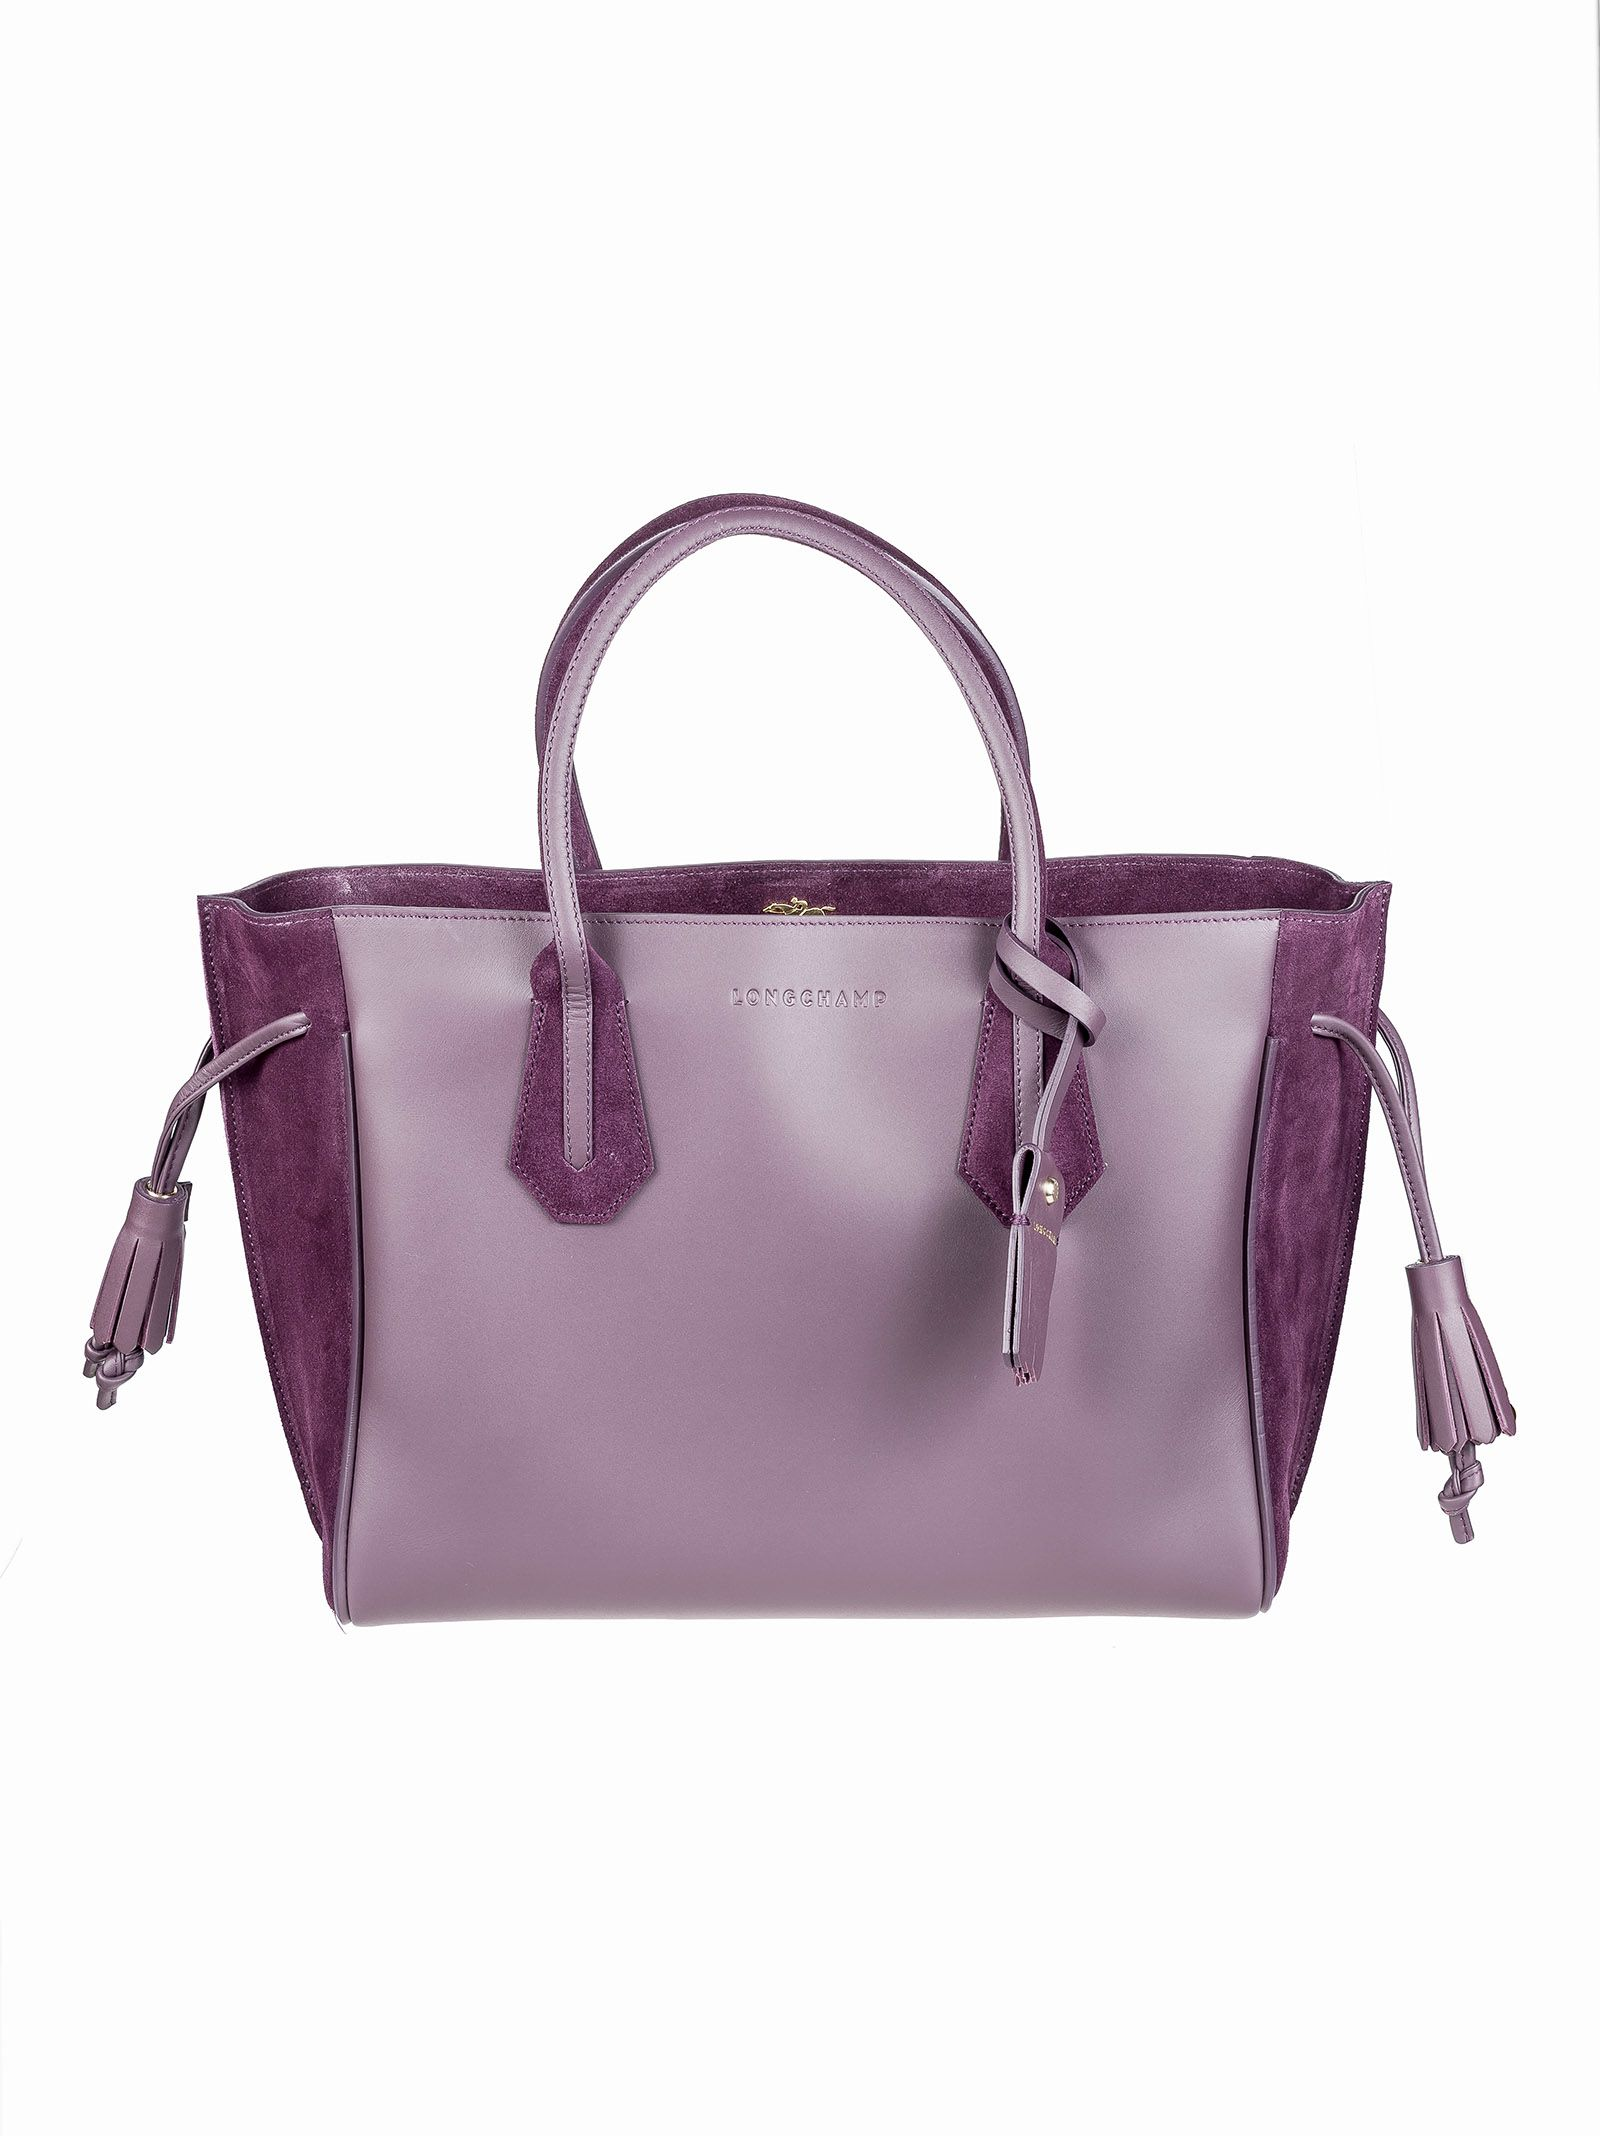 Longchamp Penelope Soft Tote